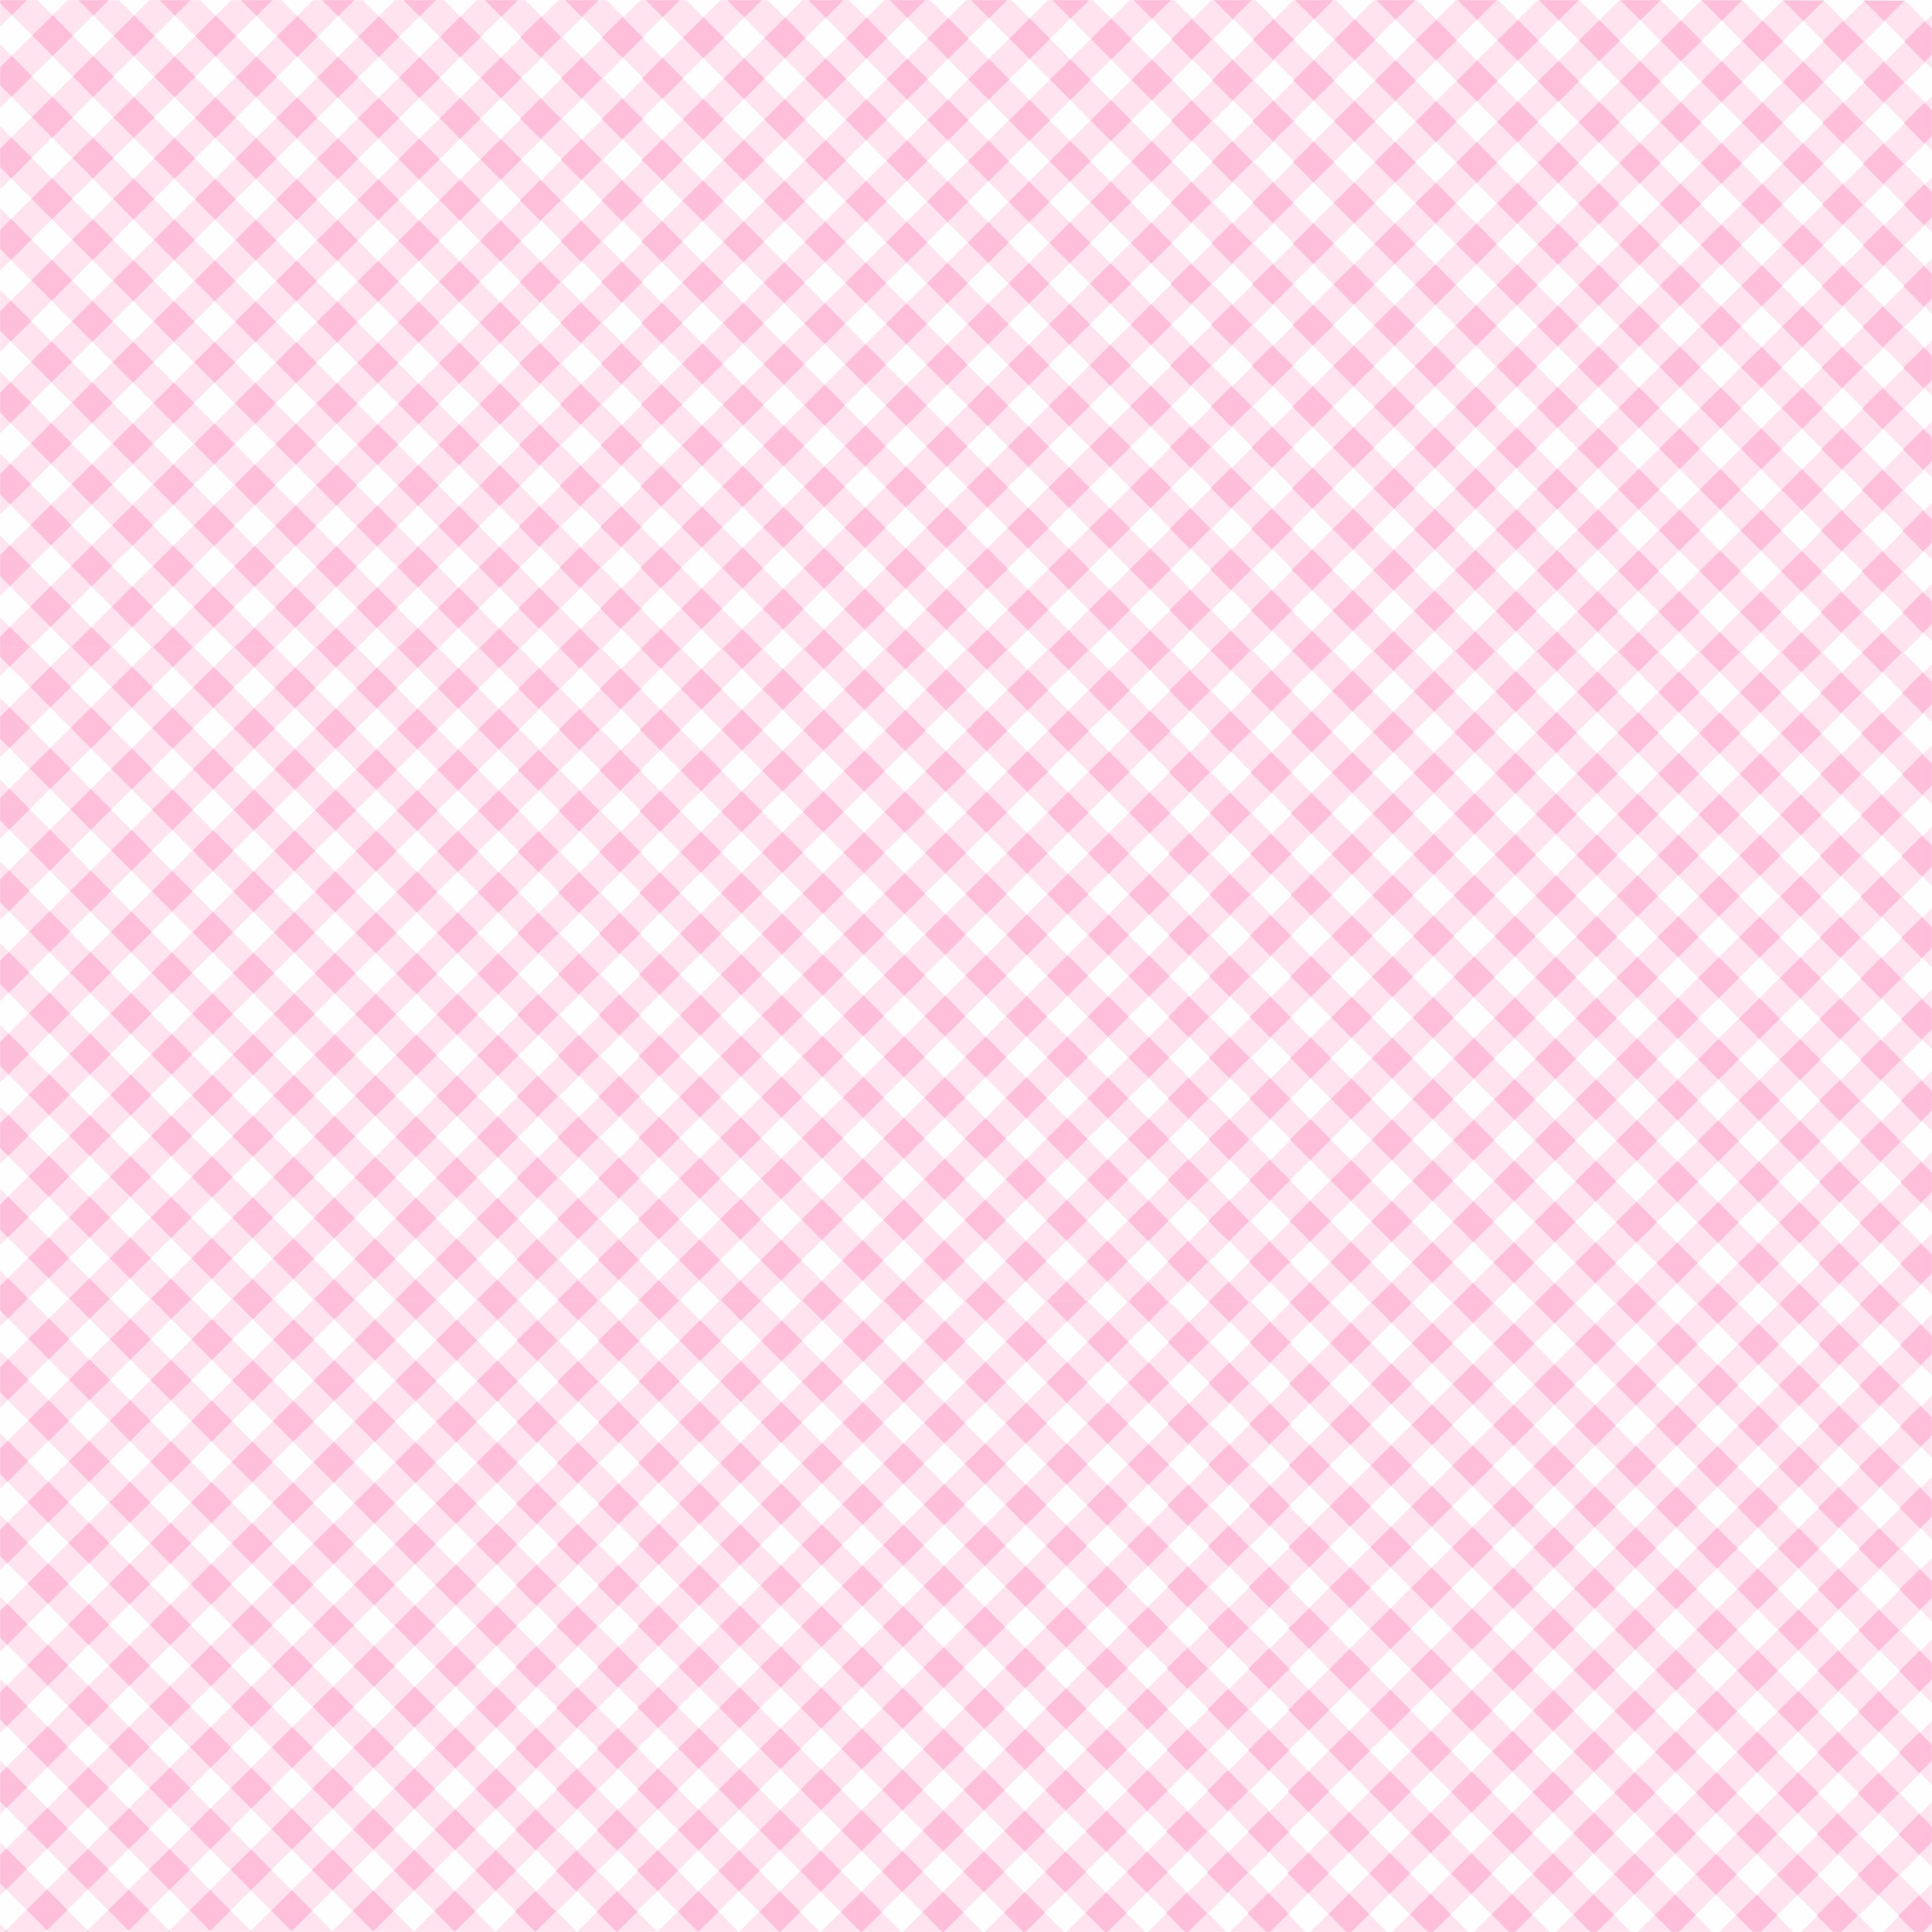 papel digital ovelhinha rosa 4